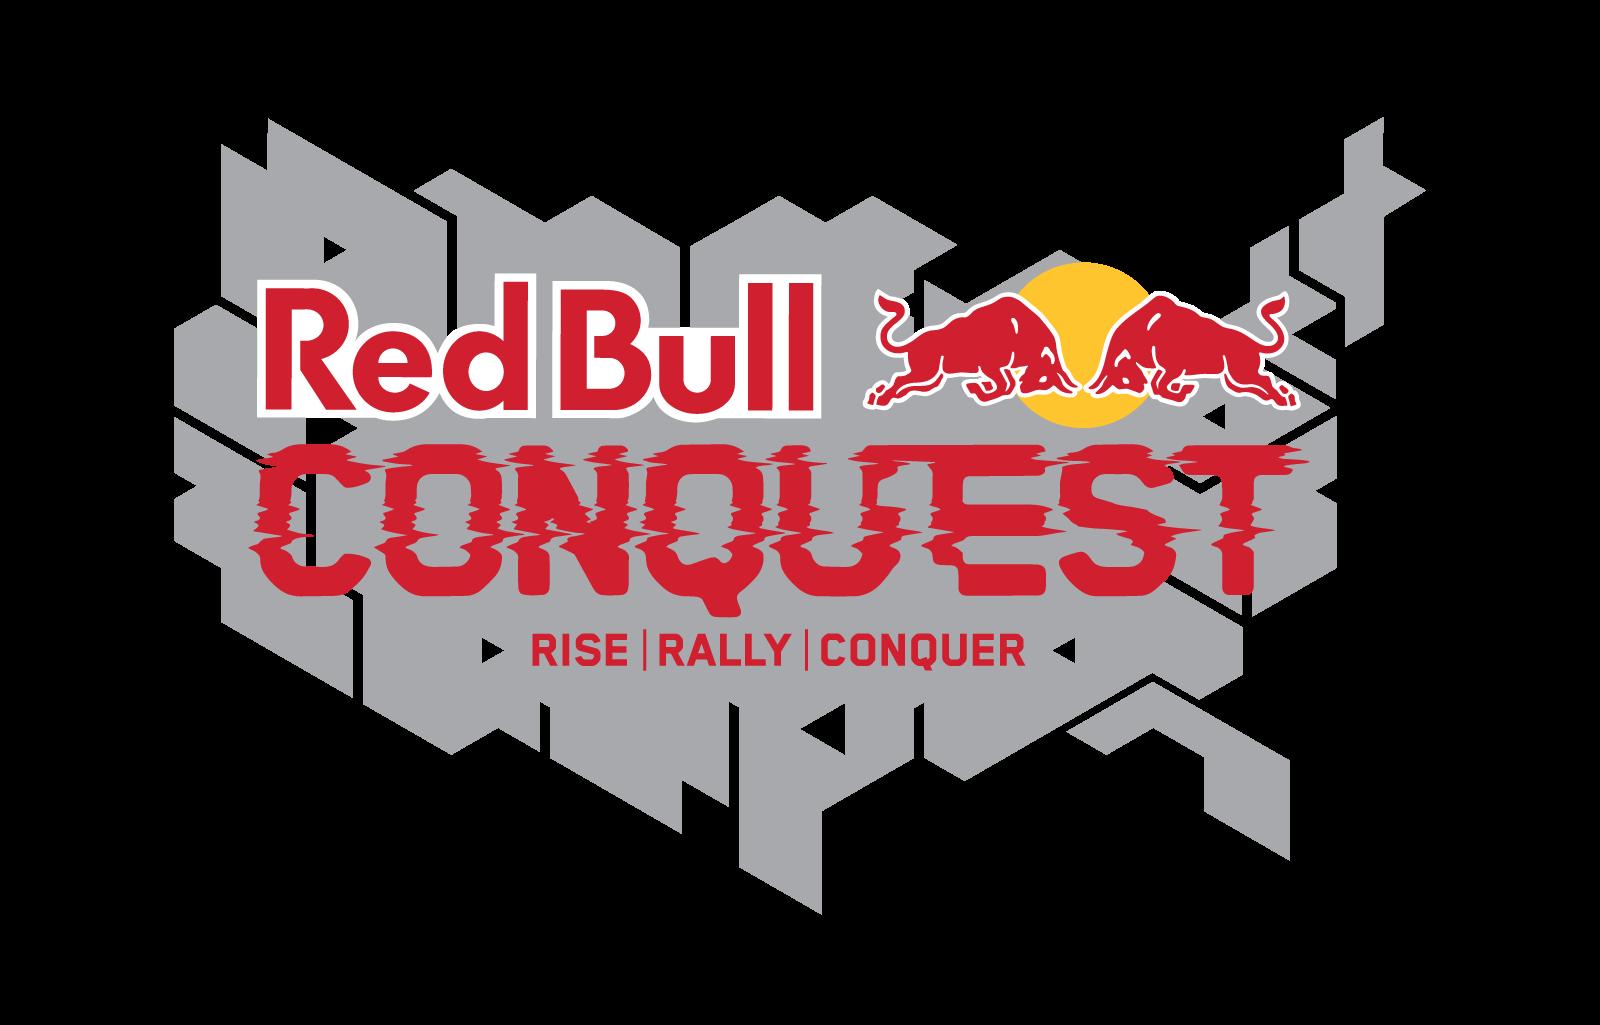 Ya hay mas informacion sobre el Red Bull Conquest